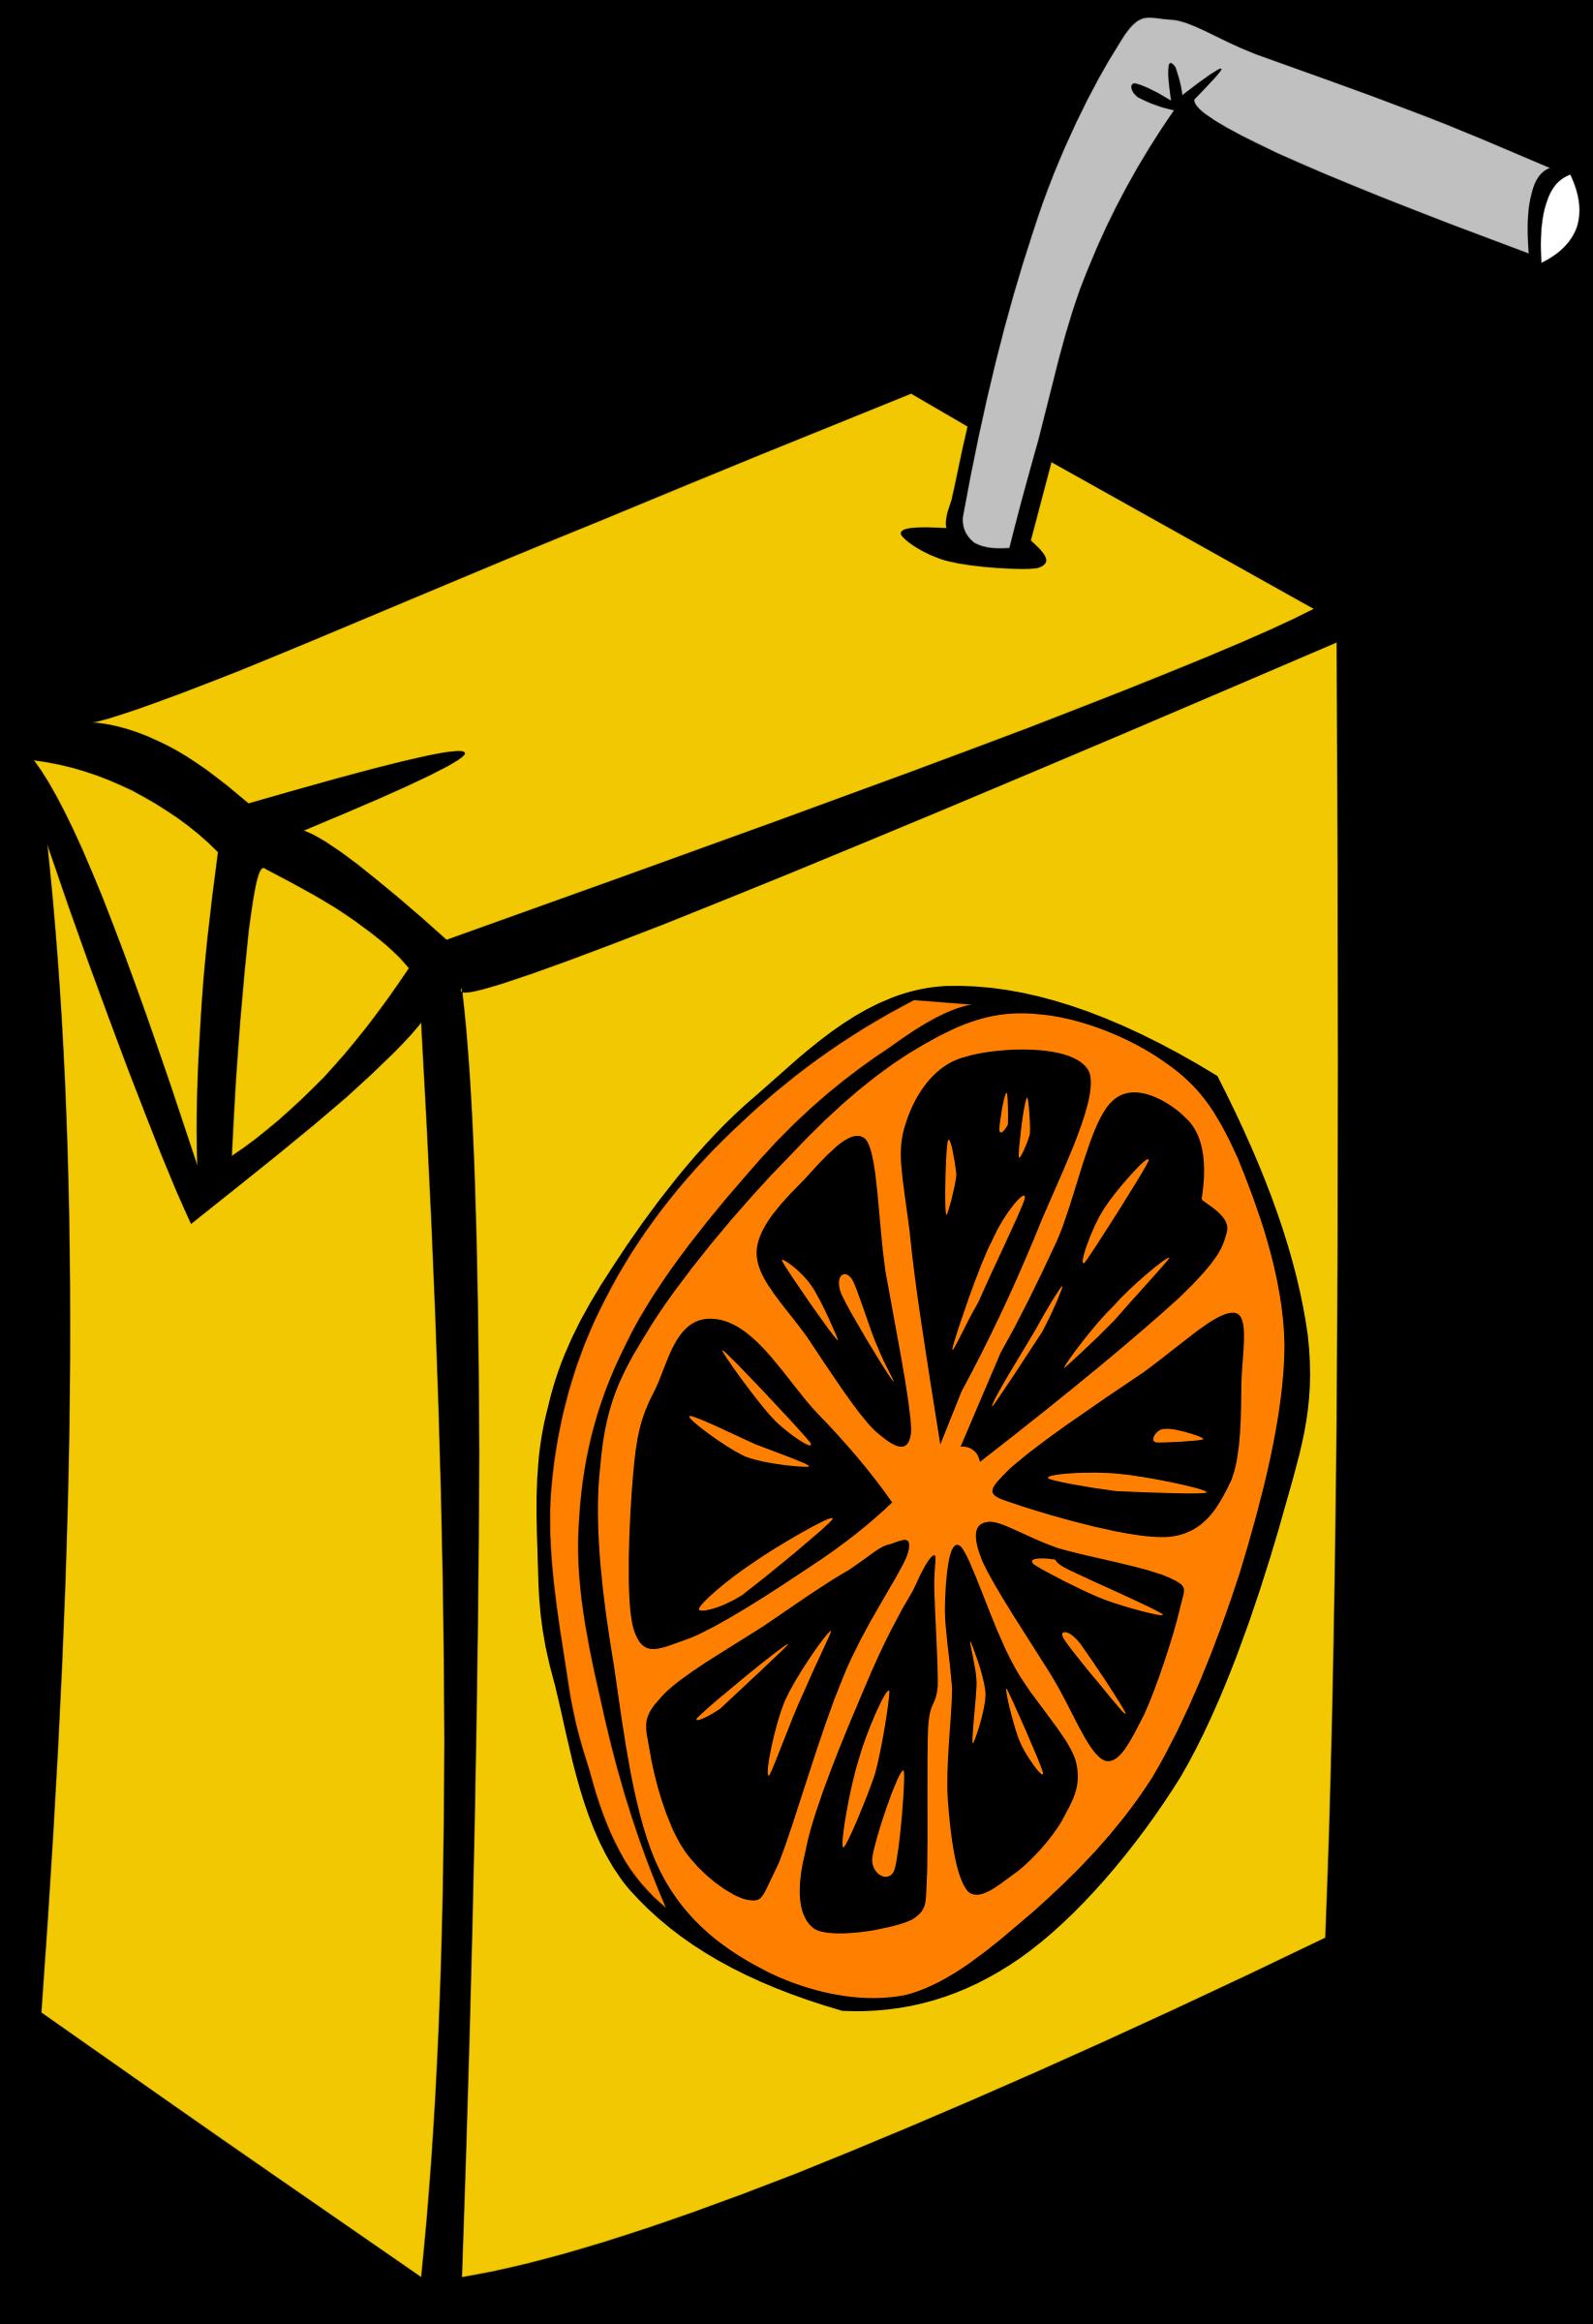 Drink clipart juice Food Fast Food Clipart Orange